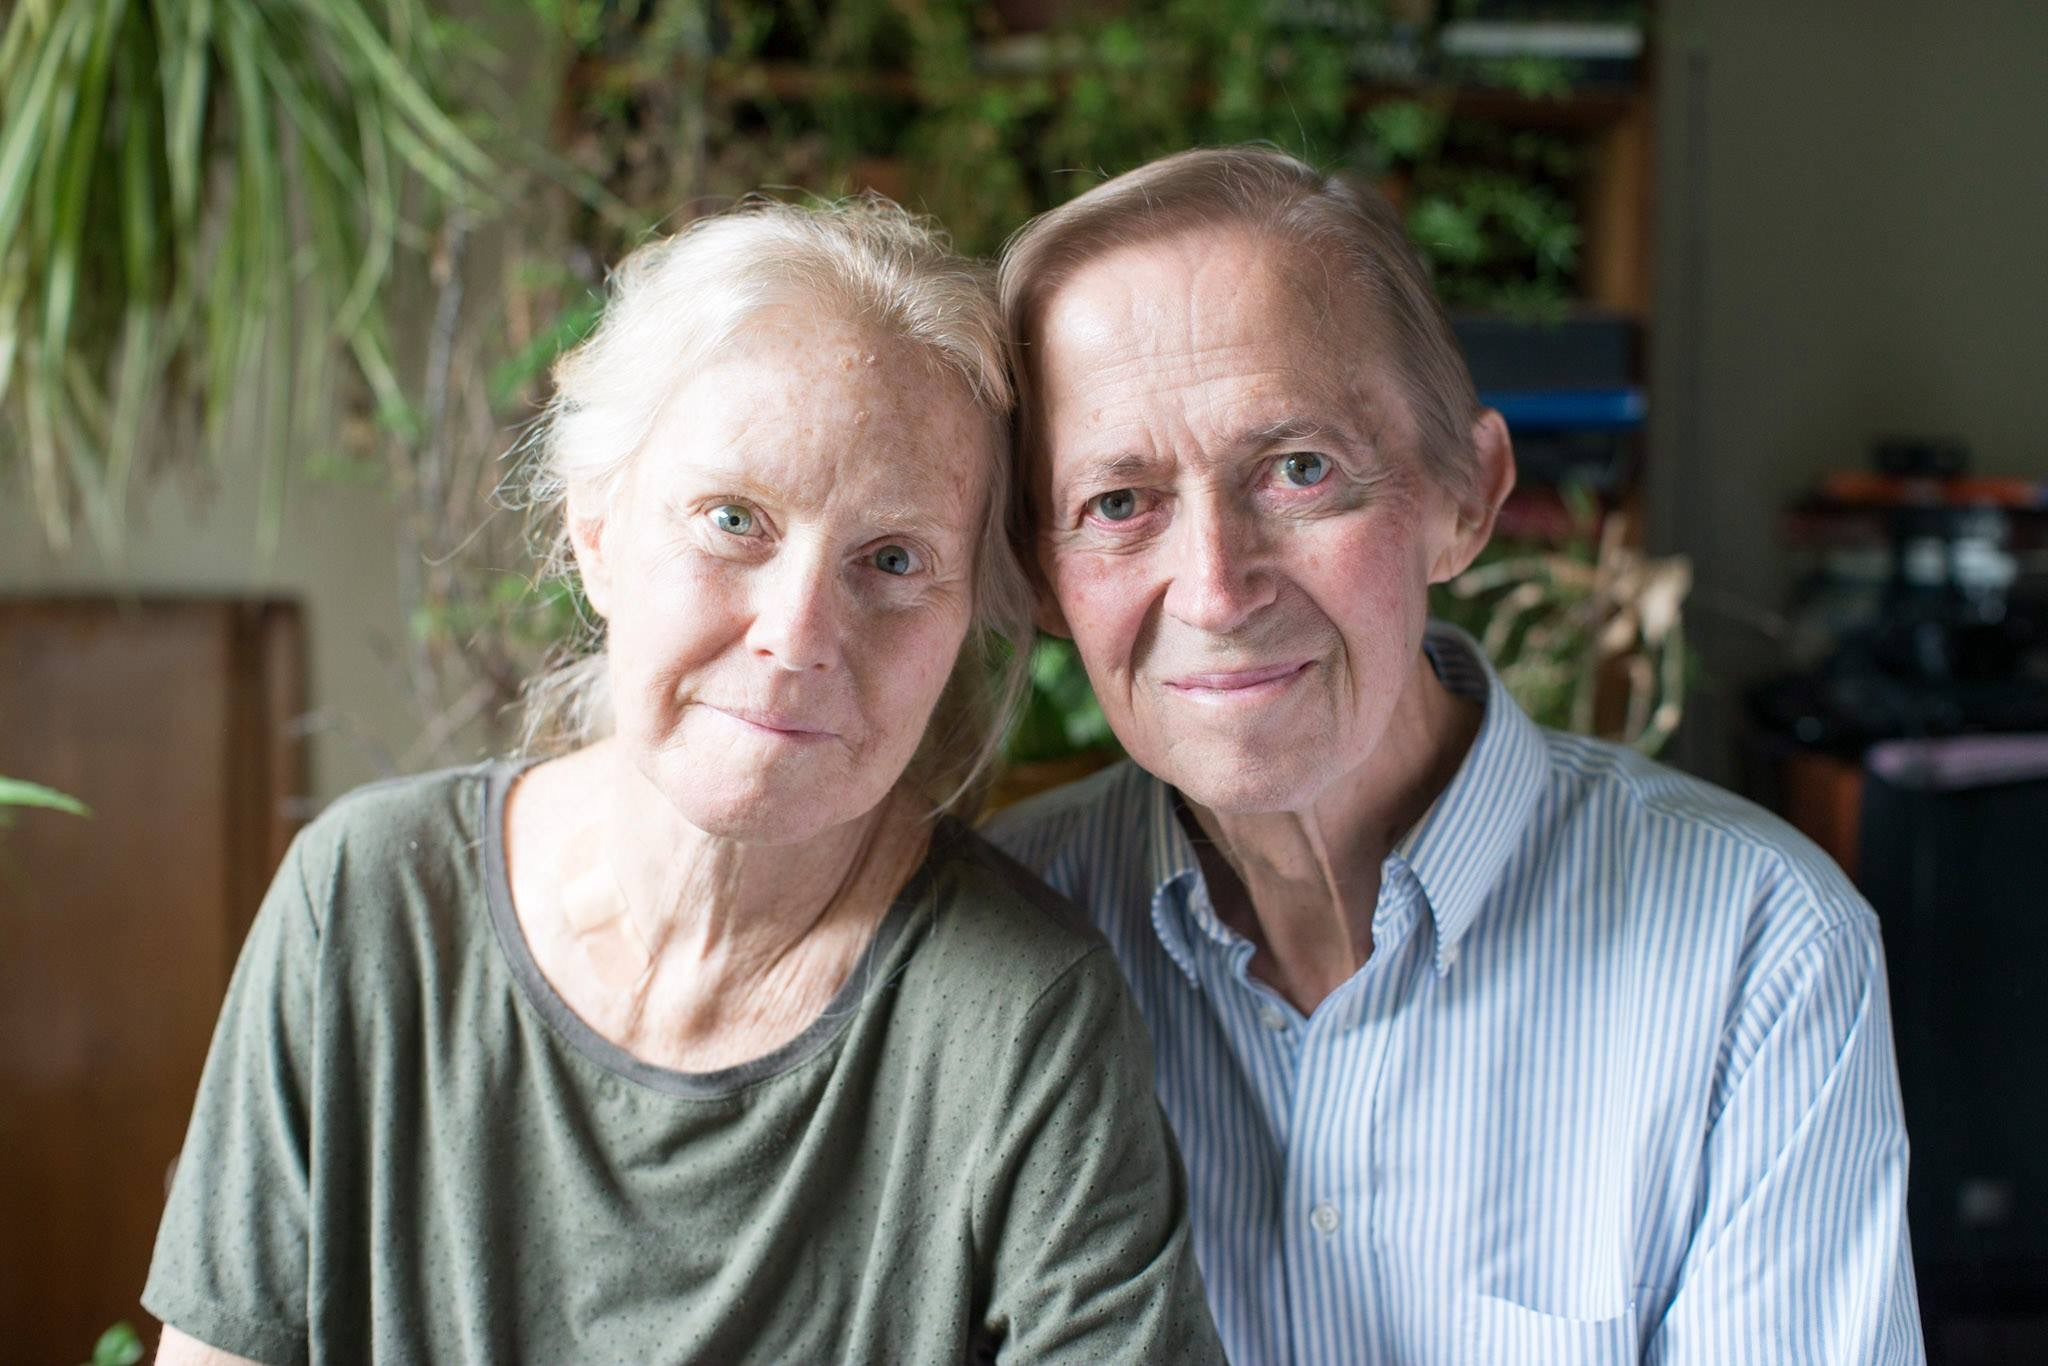 Alison and David Maslanka in late June 2017